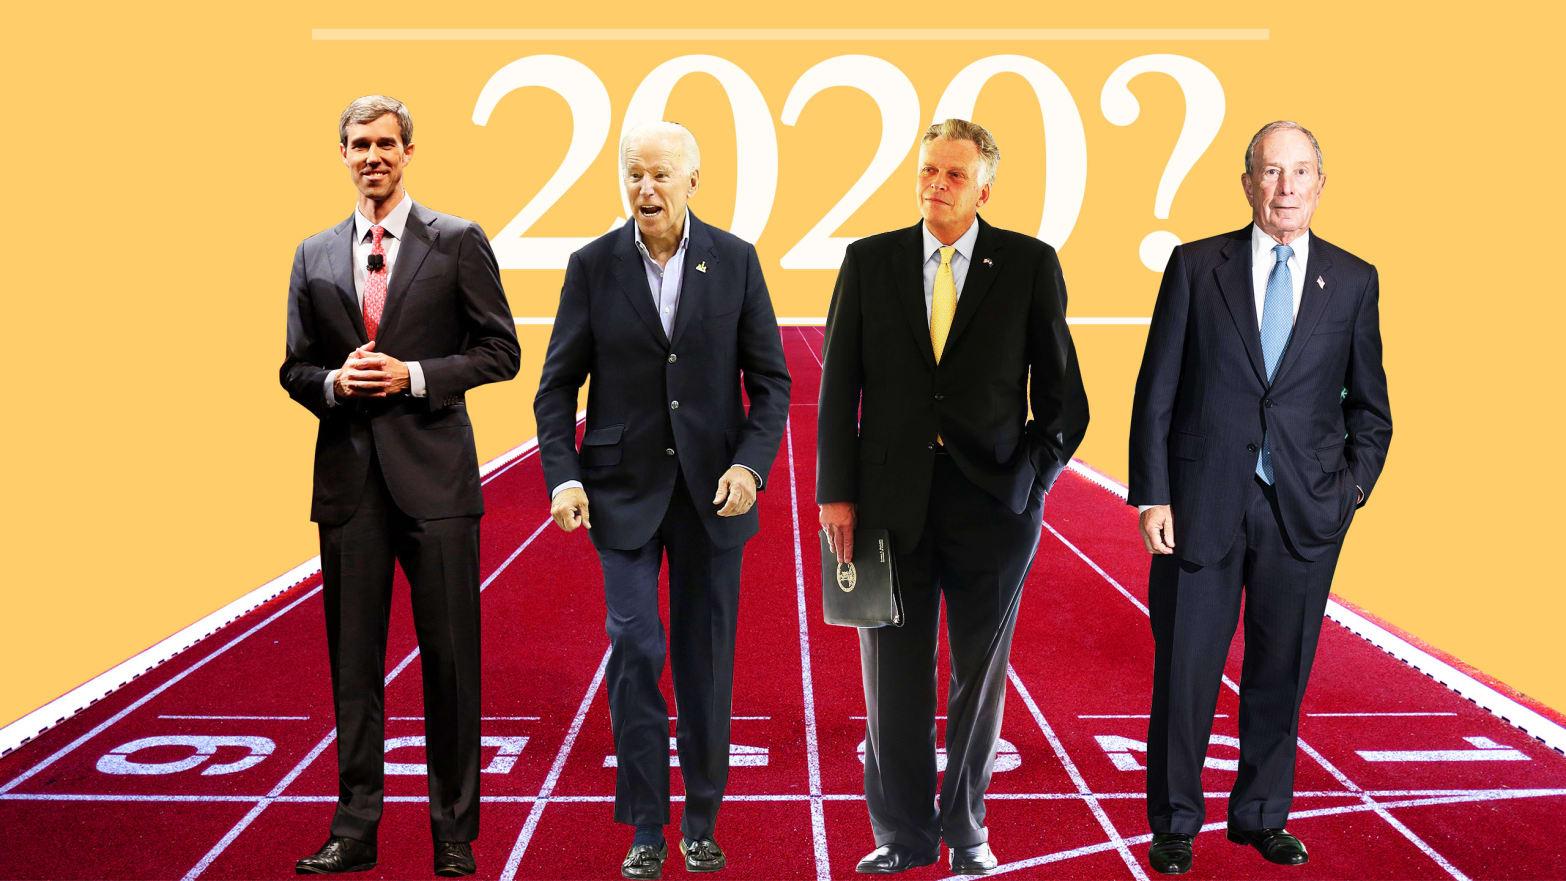 Dems Debate II – A Challenges to Biden and a Socialist Agenda